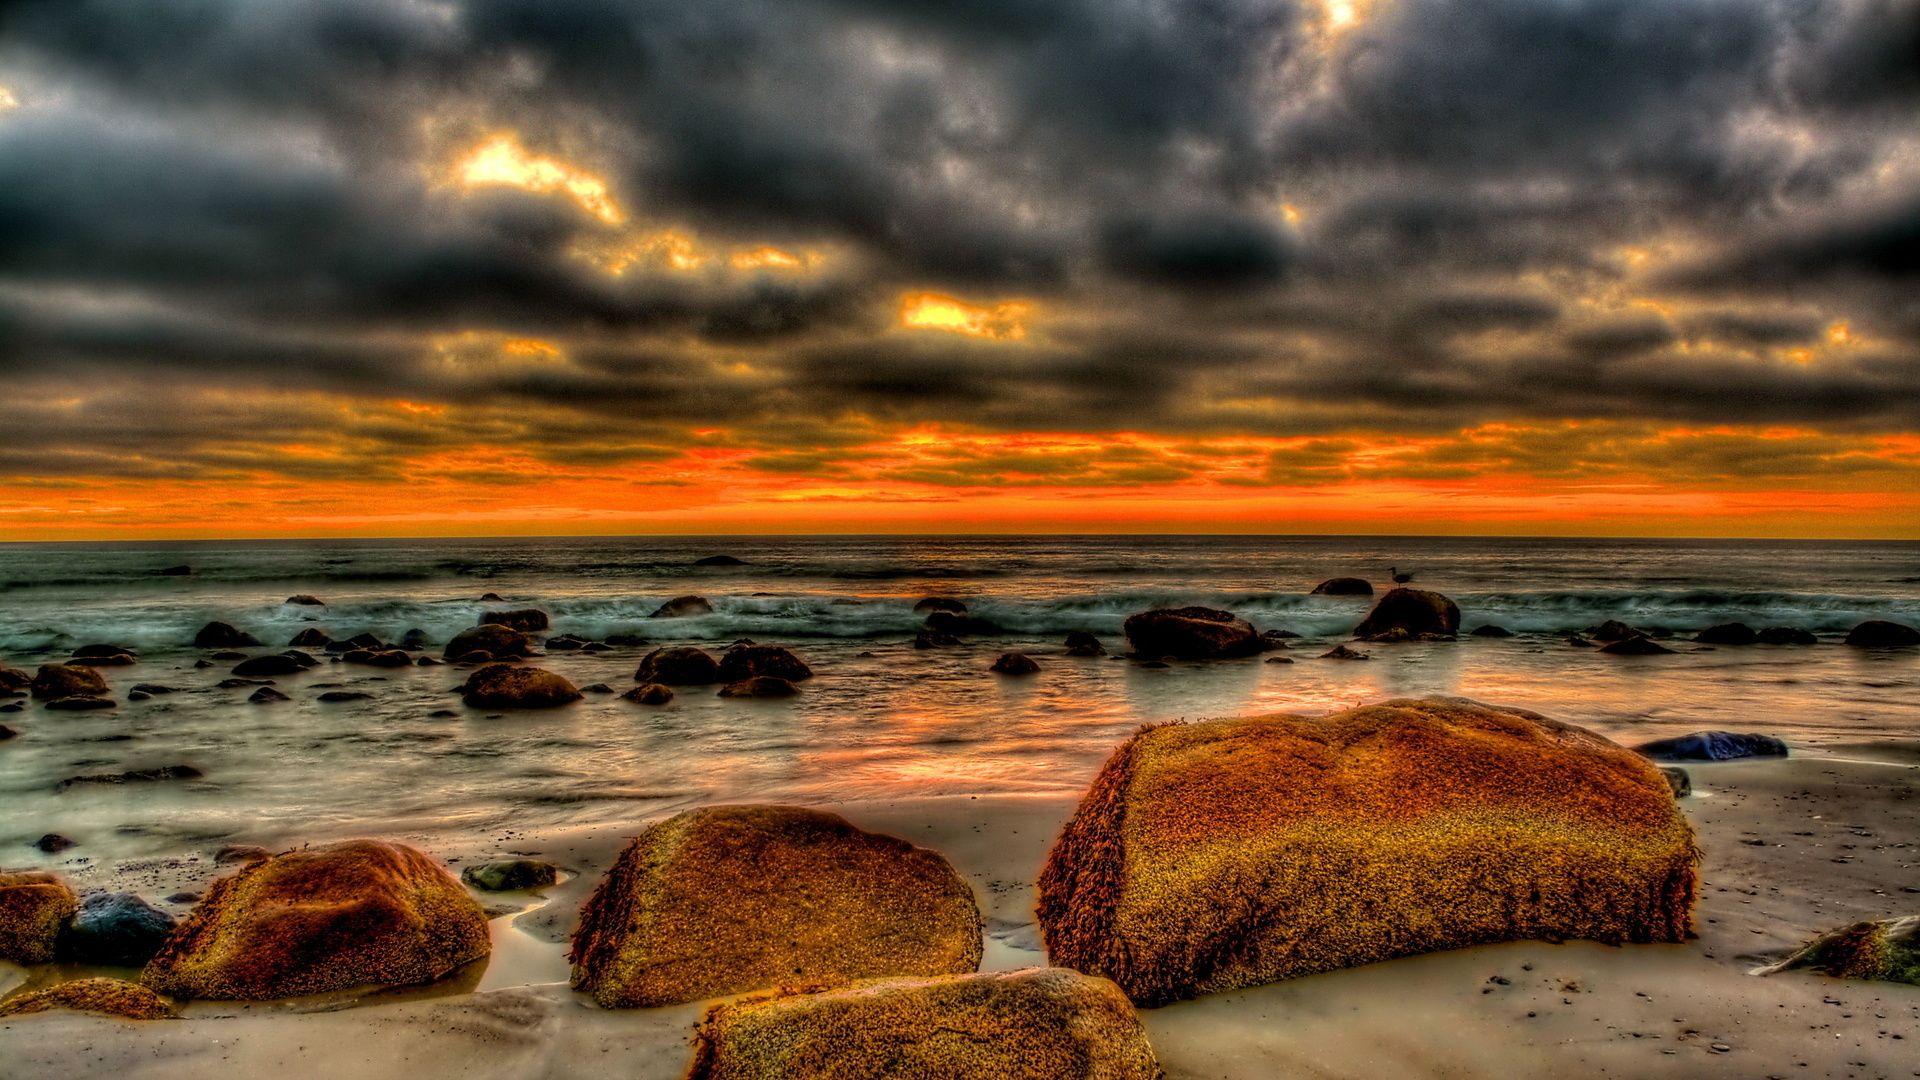 Sunset Beach Rocks Sunset Beautiful Beaches Hd wallpaper clouds beach sea rocks